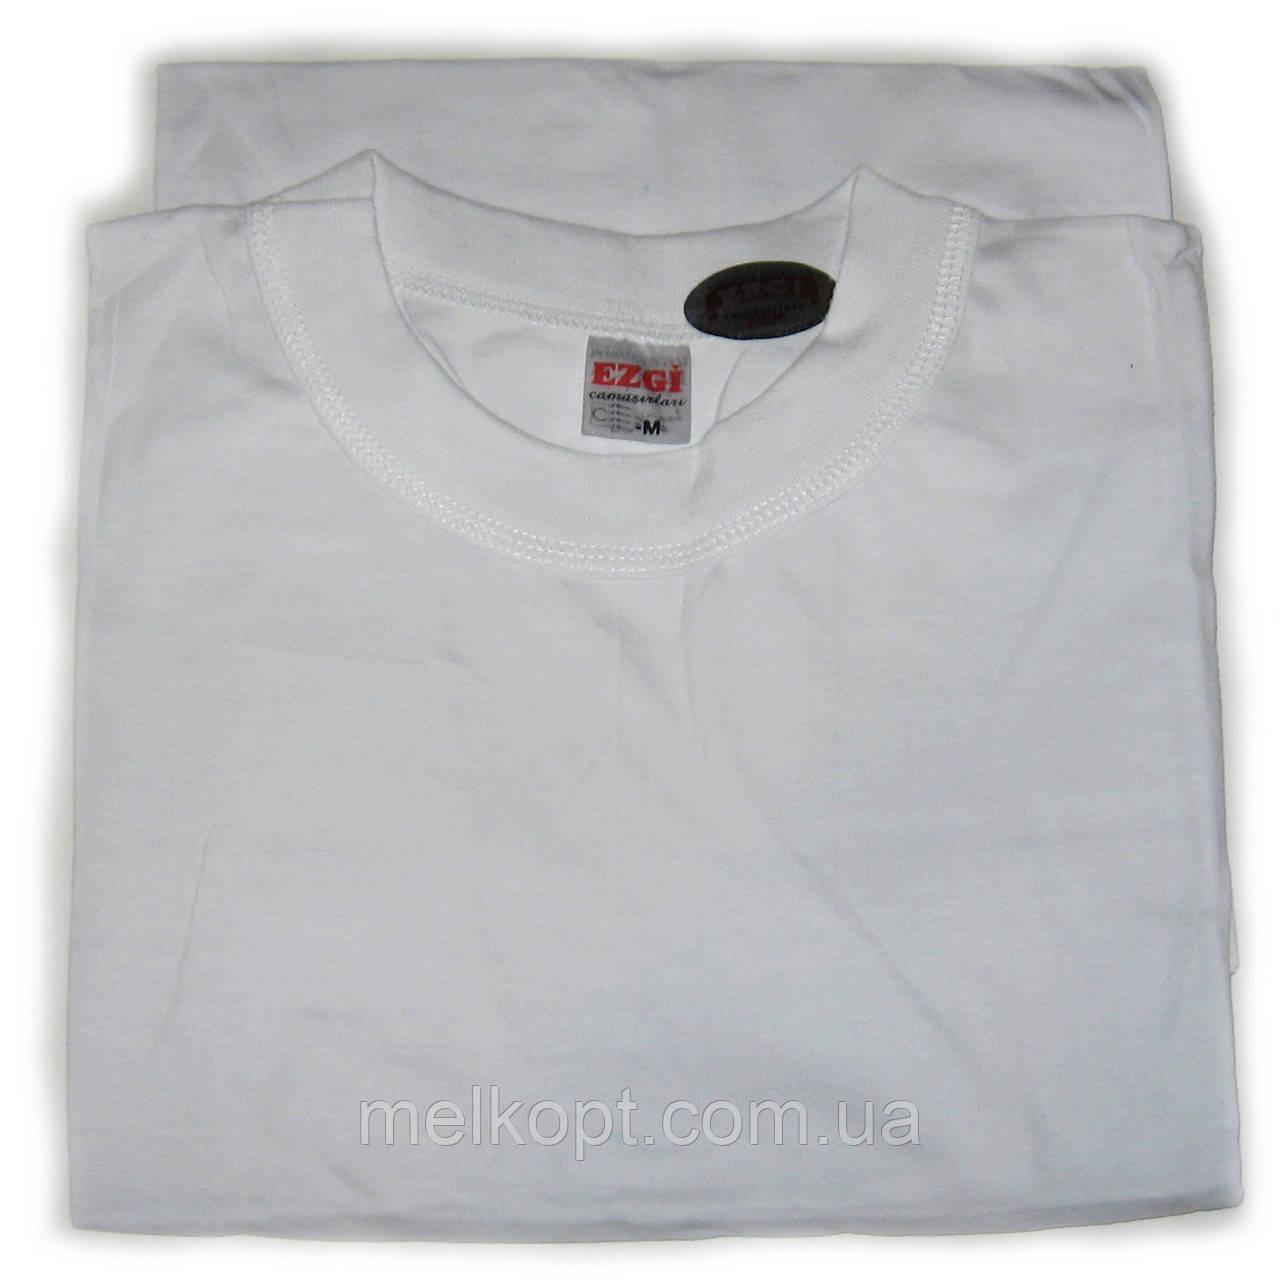 Мужские футболки Ezgi - 58,00 грн./шт. (60-й размер, белые)